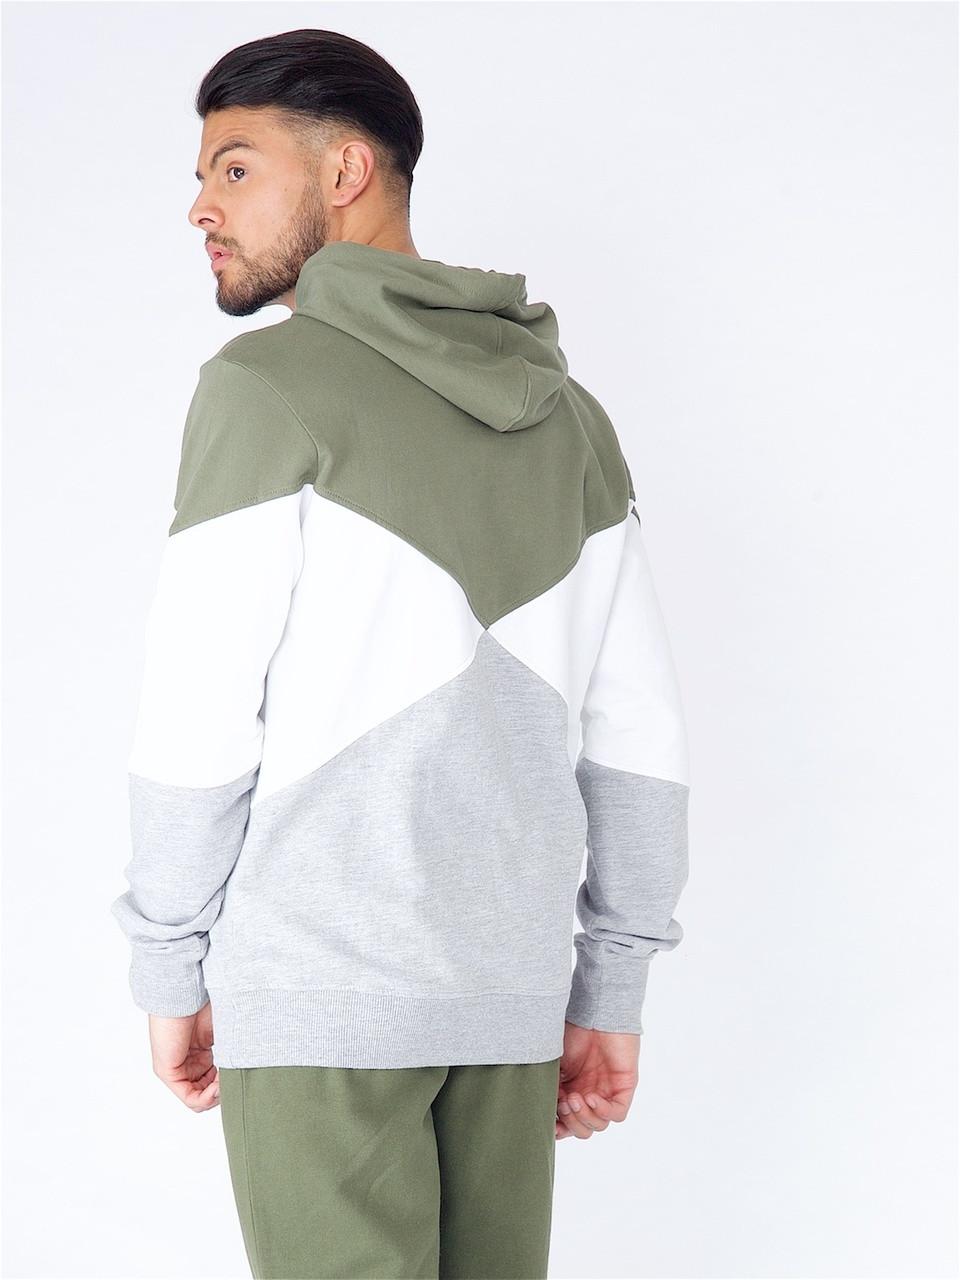 Khaki Cut & Sew Over The Head Hood